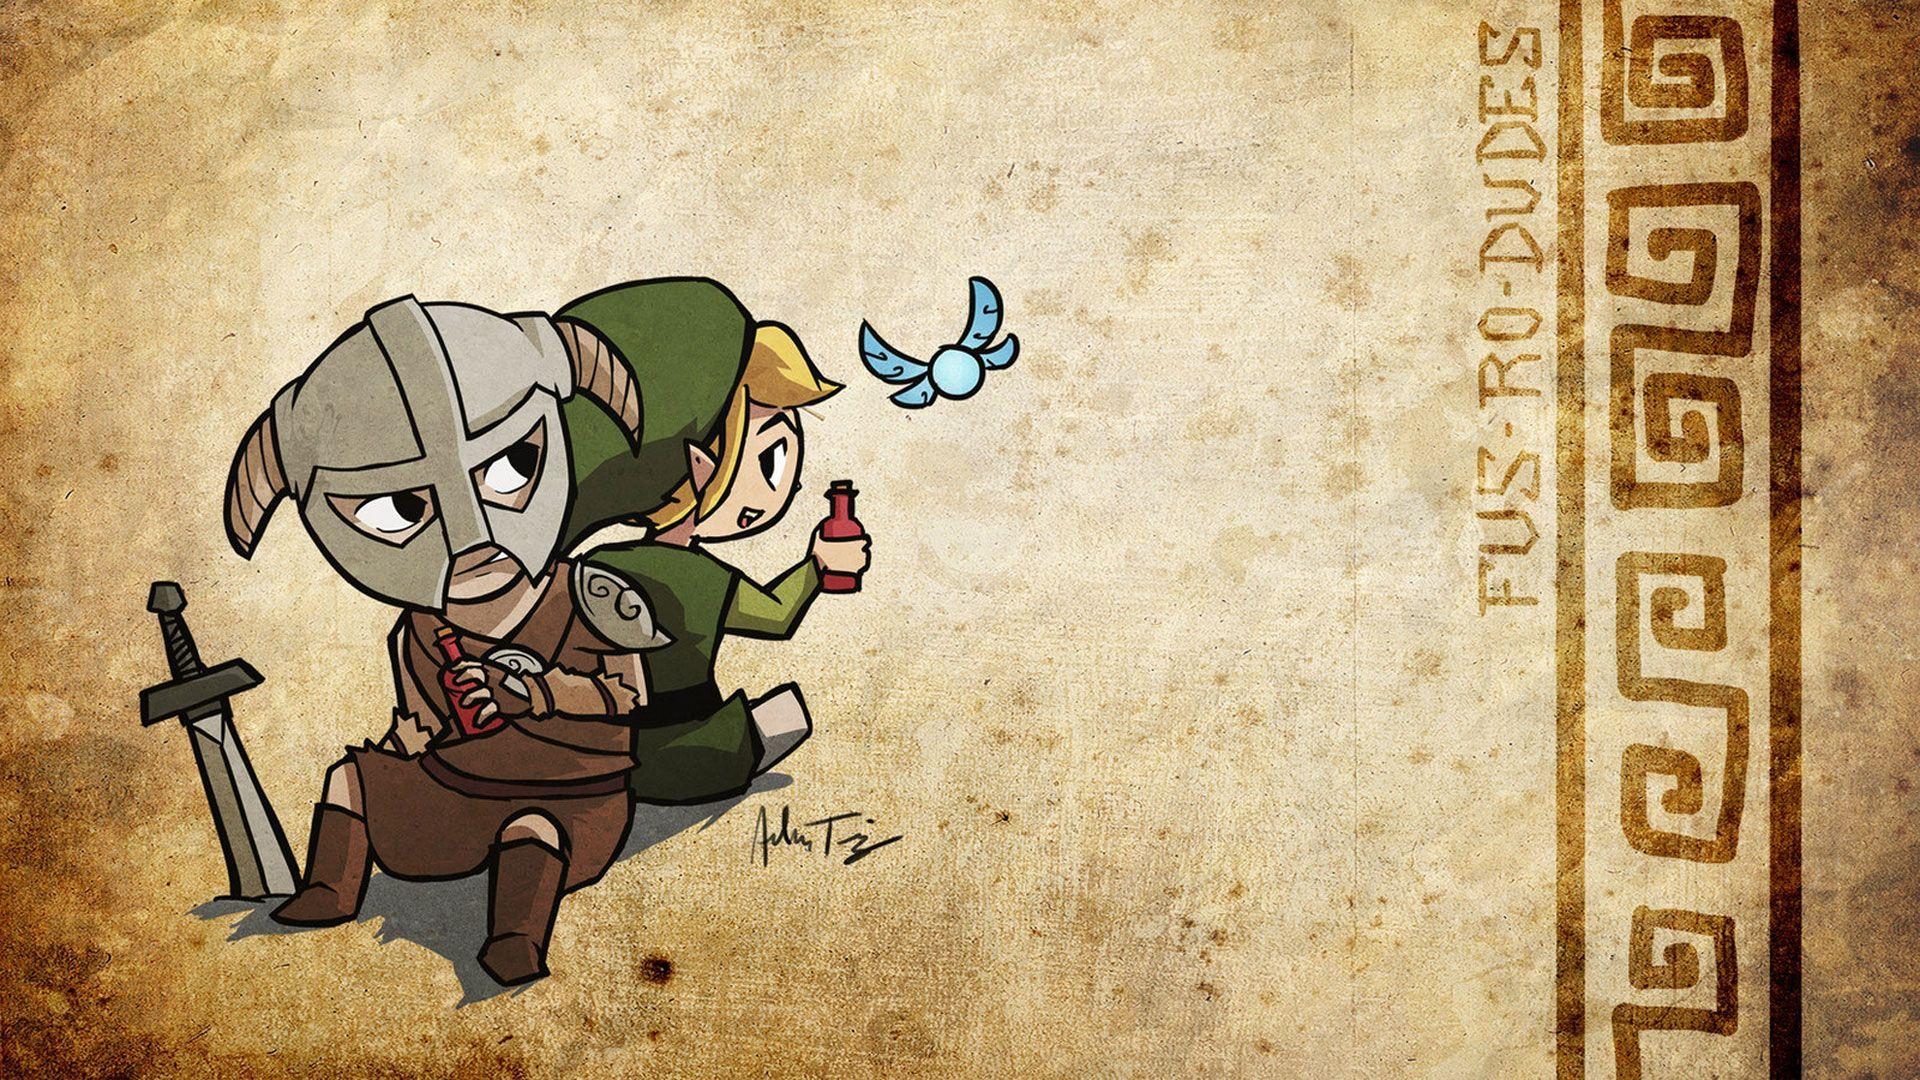 Cool Skyrim/Zelda mash up Wall Paper | Video Game Shrine | Pinterest ...